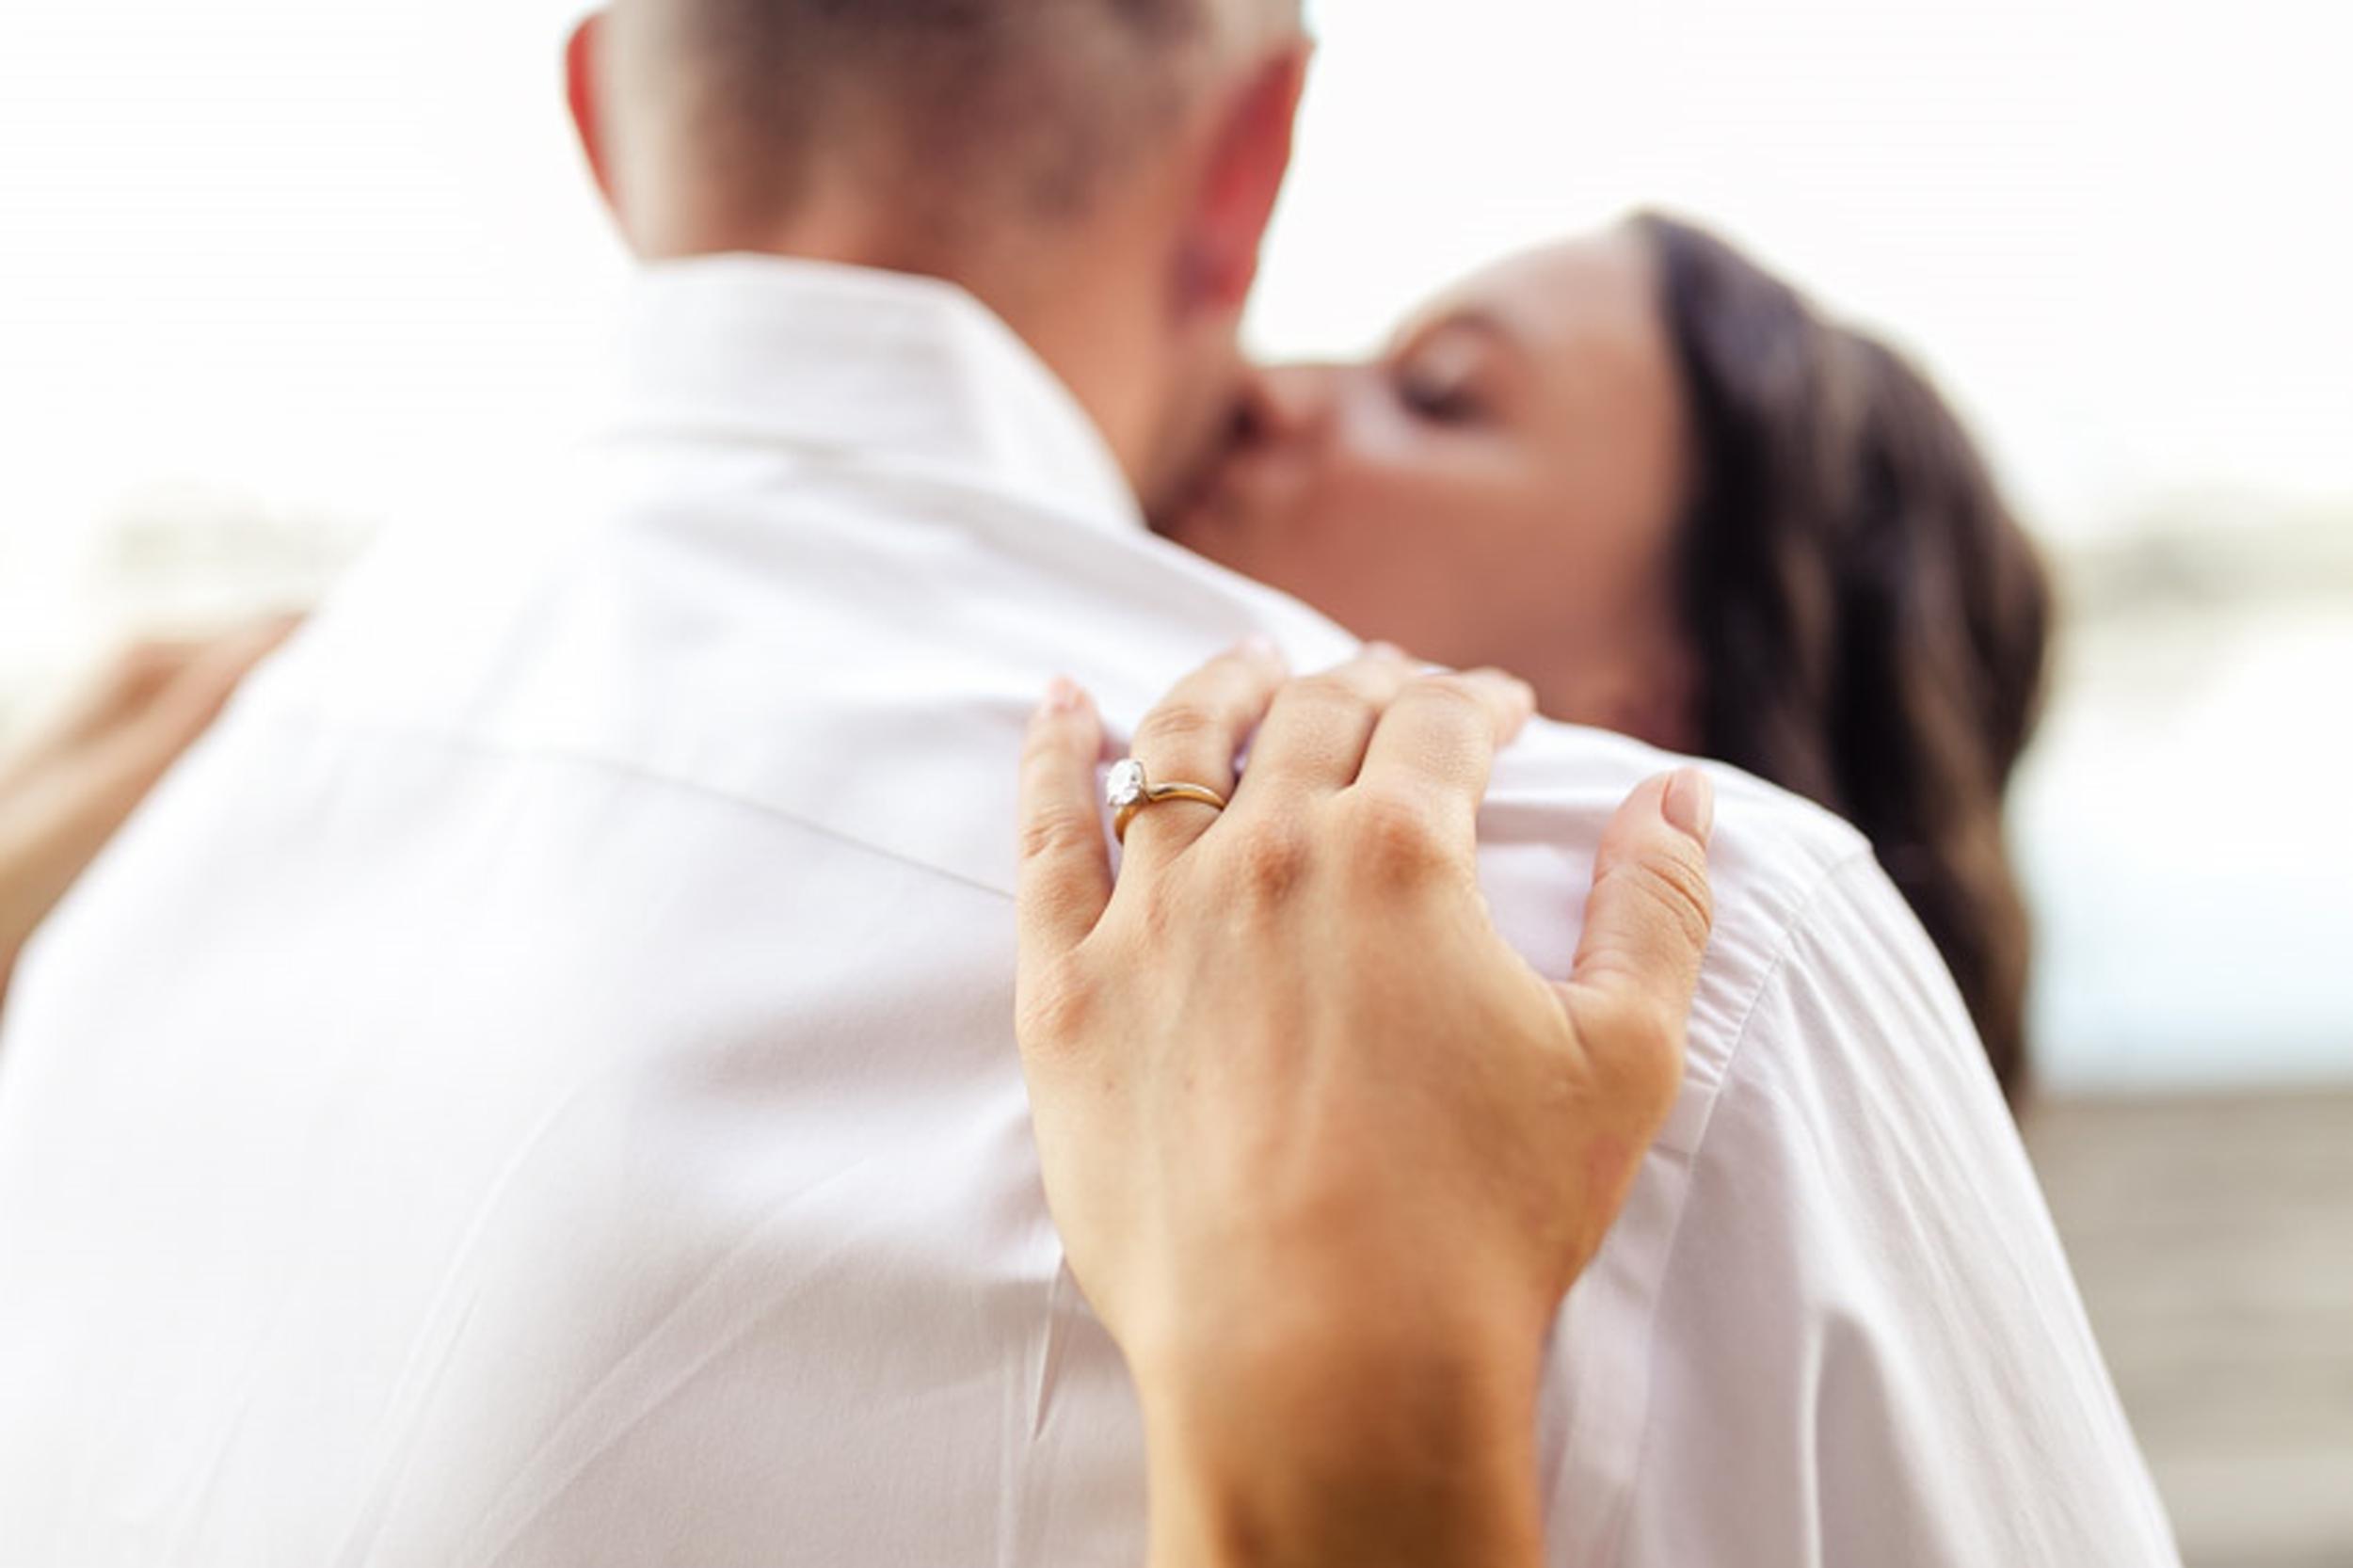 Kissing Engagement Ring